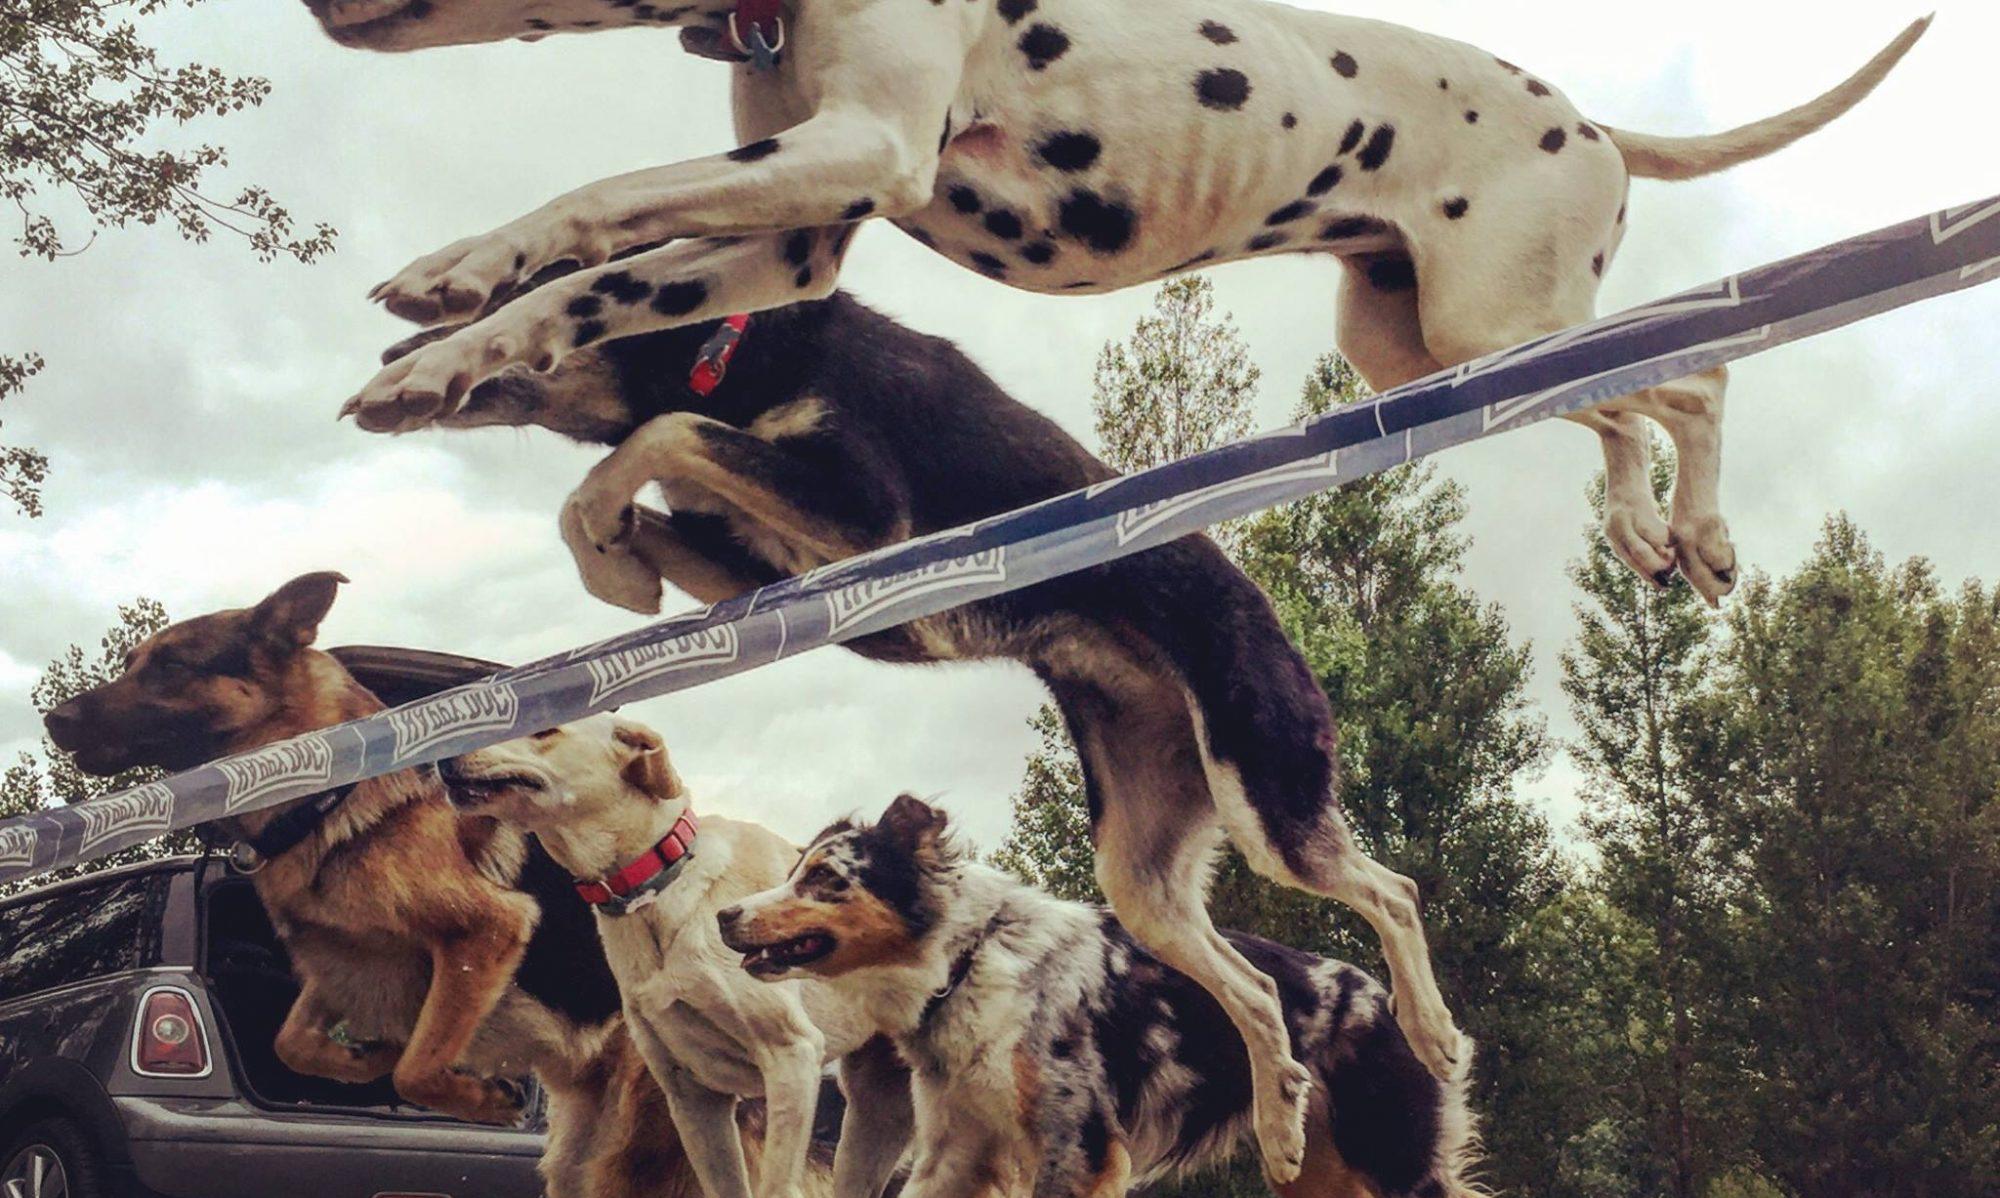 Sporting club canin de Villeneuve Tolosane